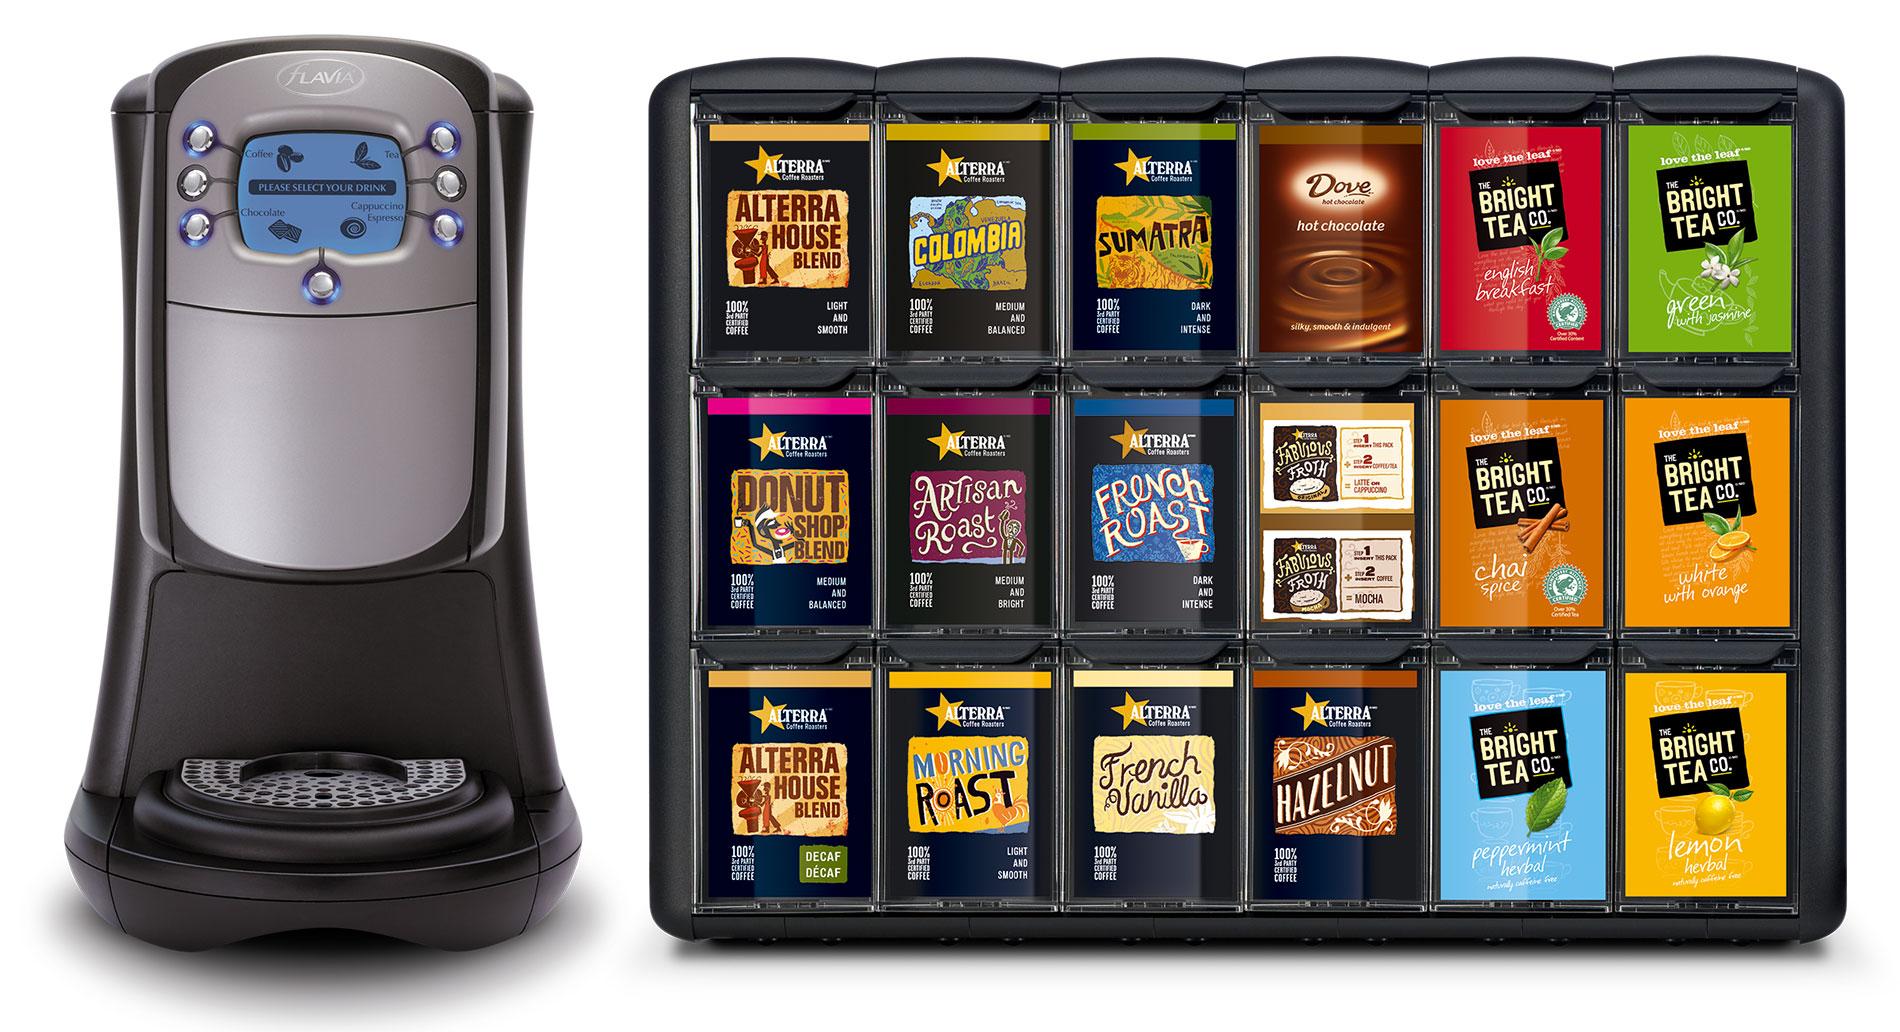 flavia coffee machine instructions